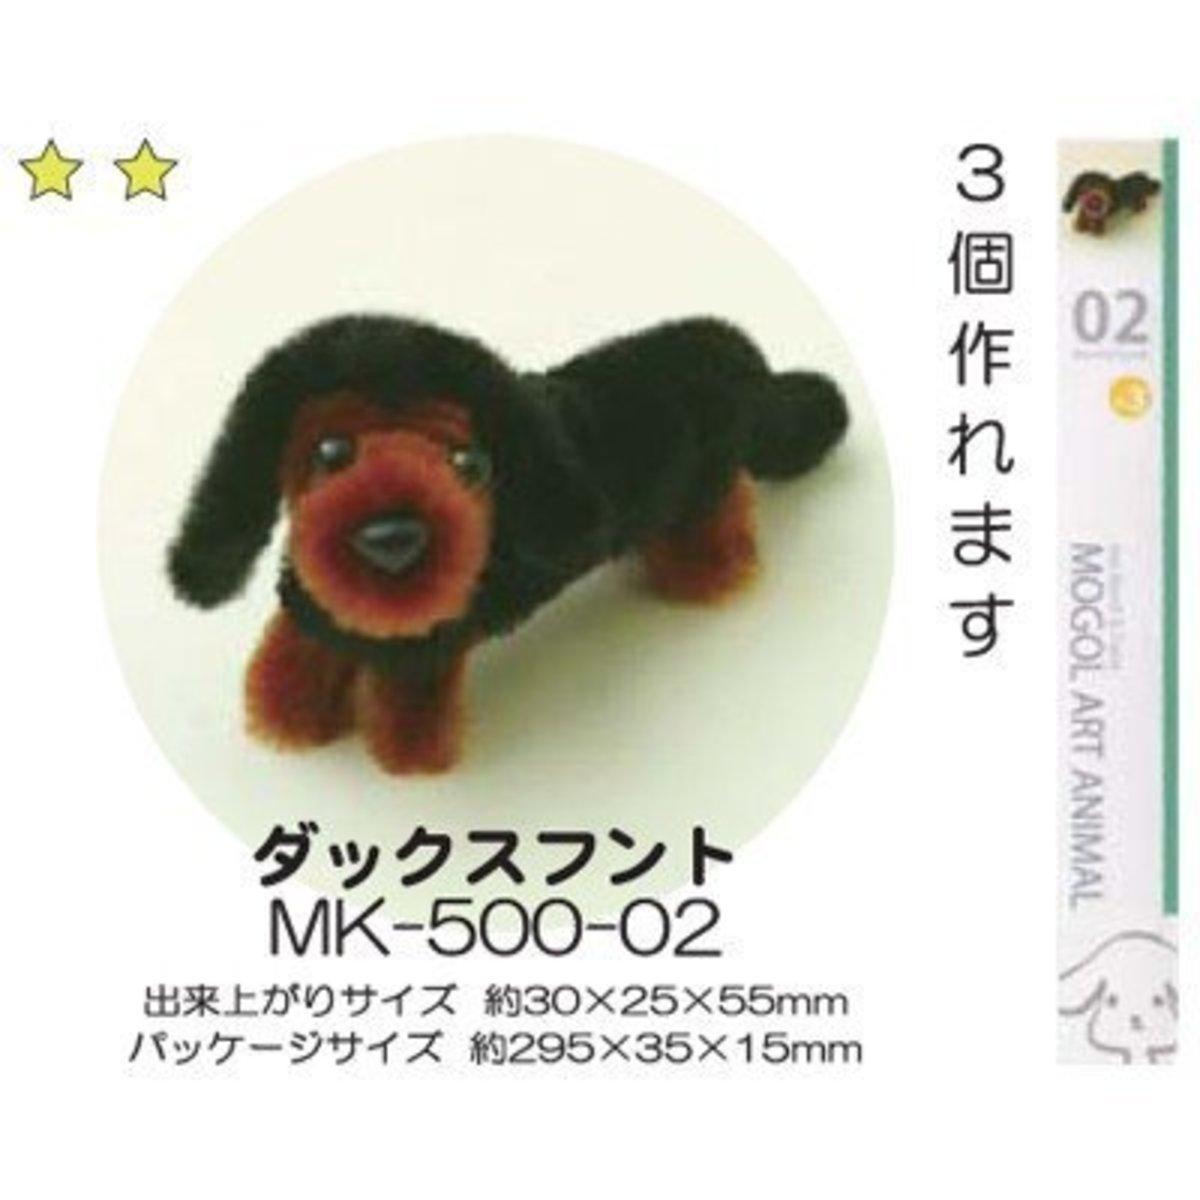 DIY Mini Dachshund Dog 3's